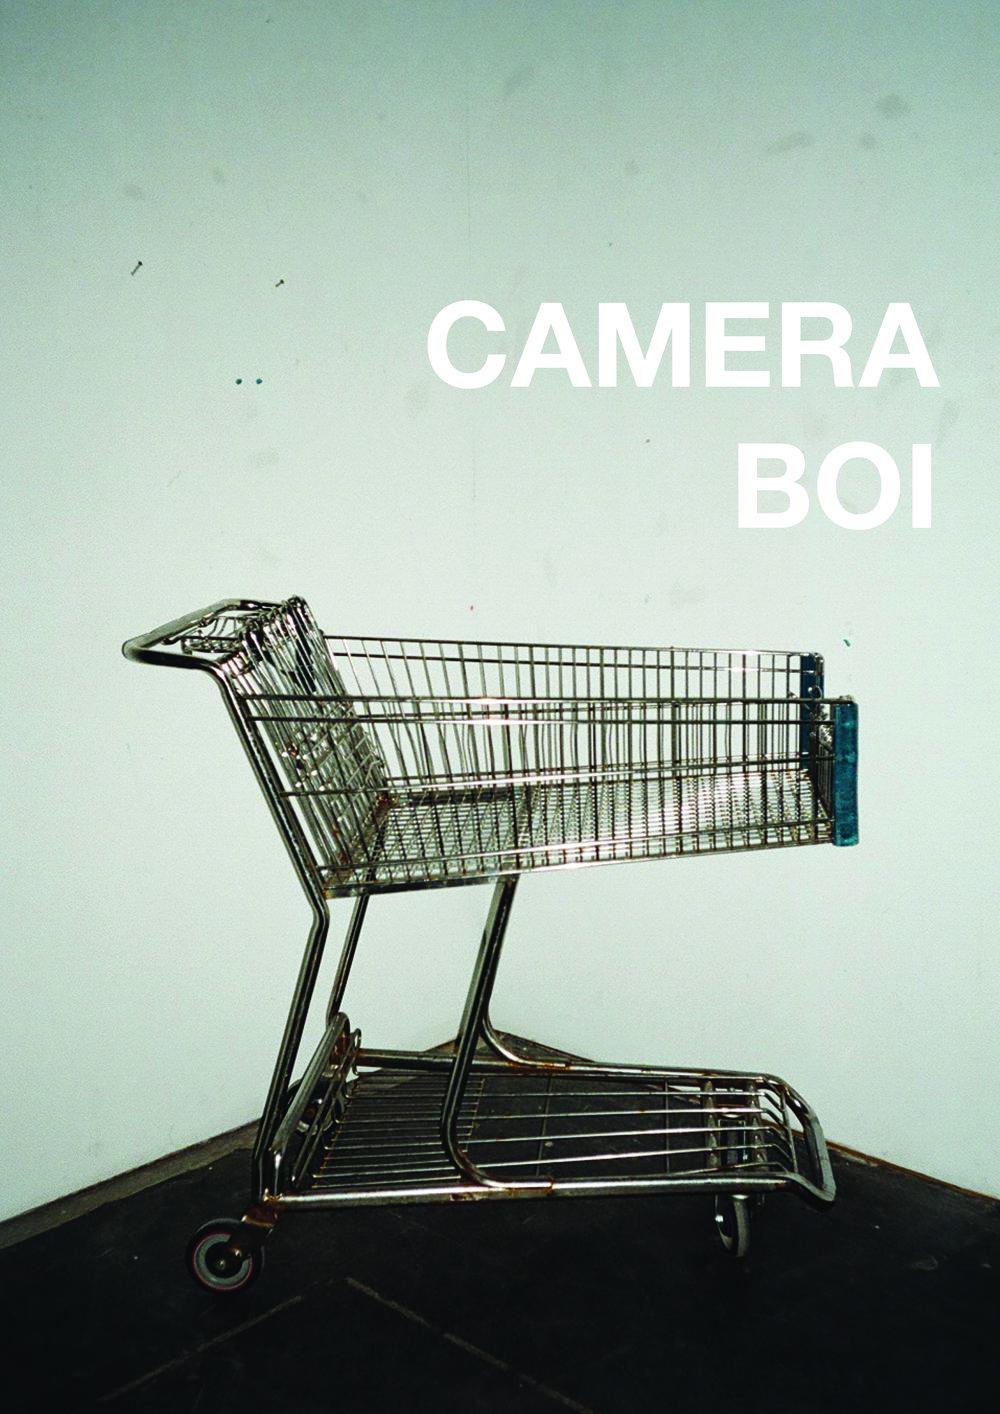 CAMERA BOI ZINE_EXPORTS.jpg